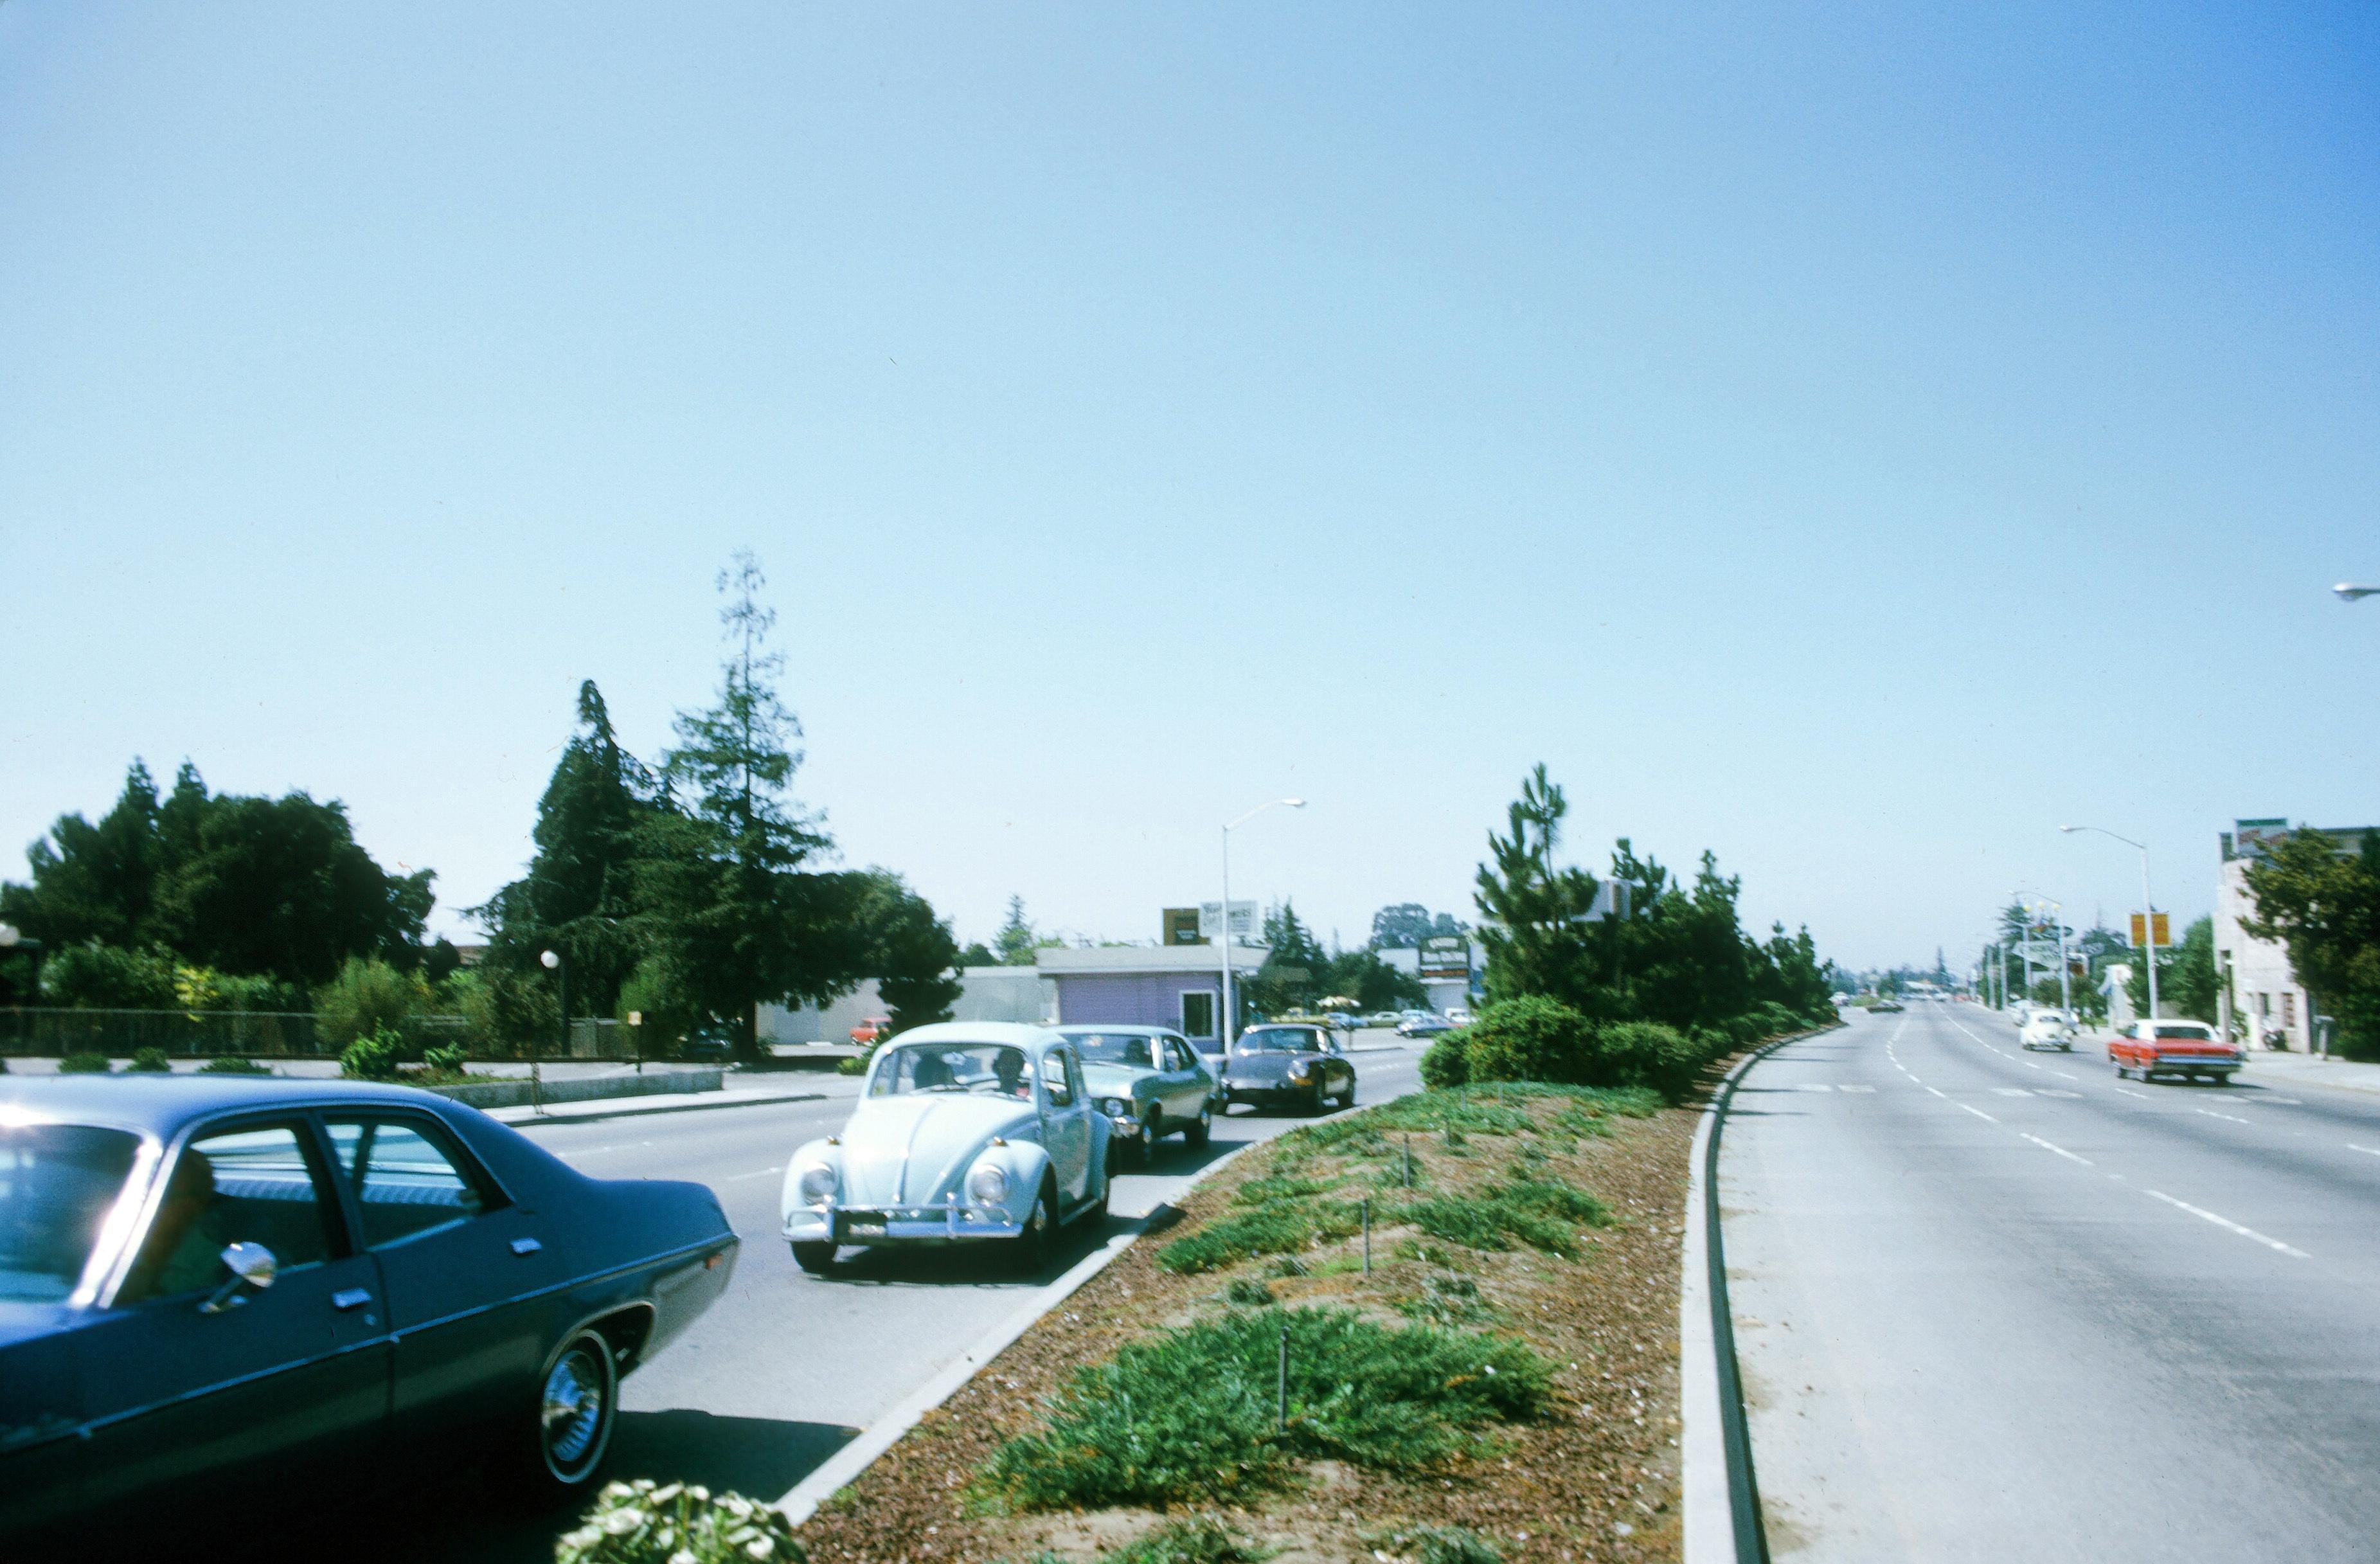 Palo Alto El Camino Real (August 1973), 1973, California, Car, Grass, HQ Photo